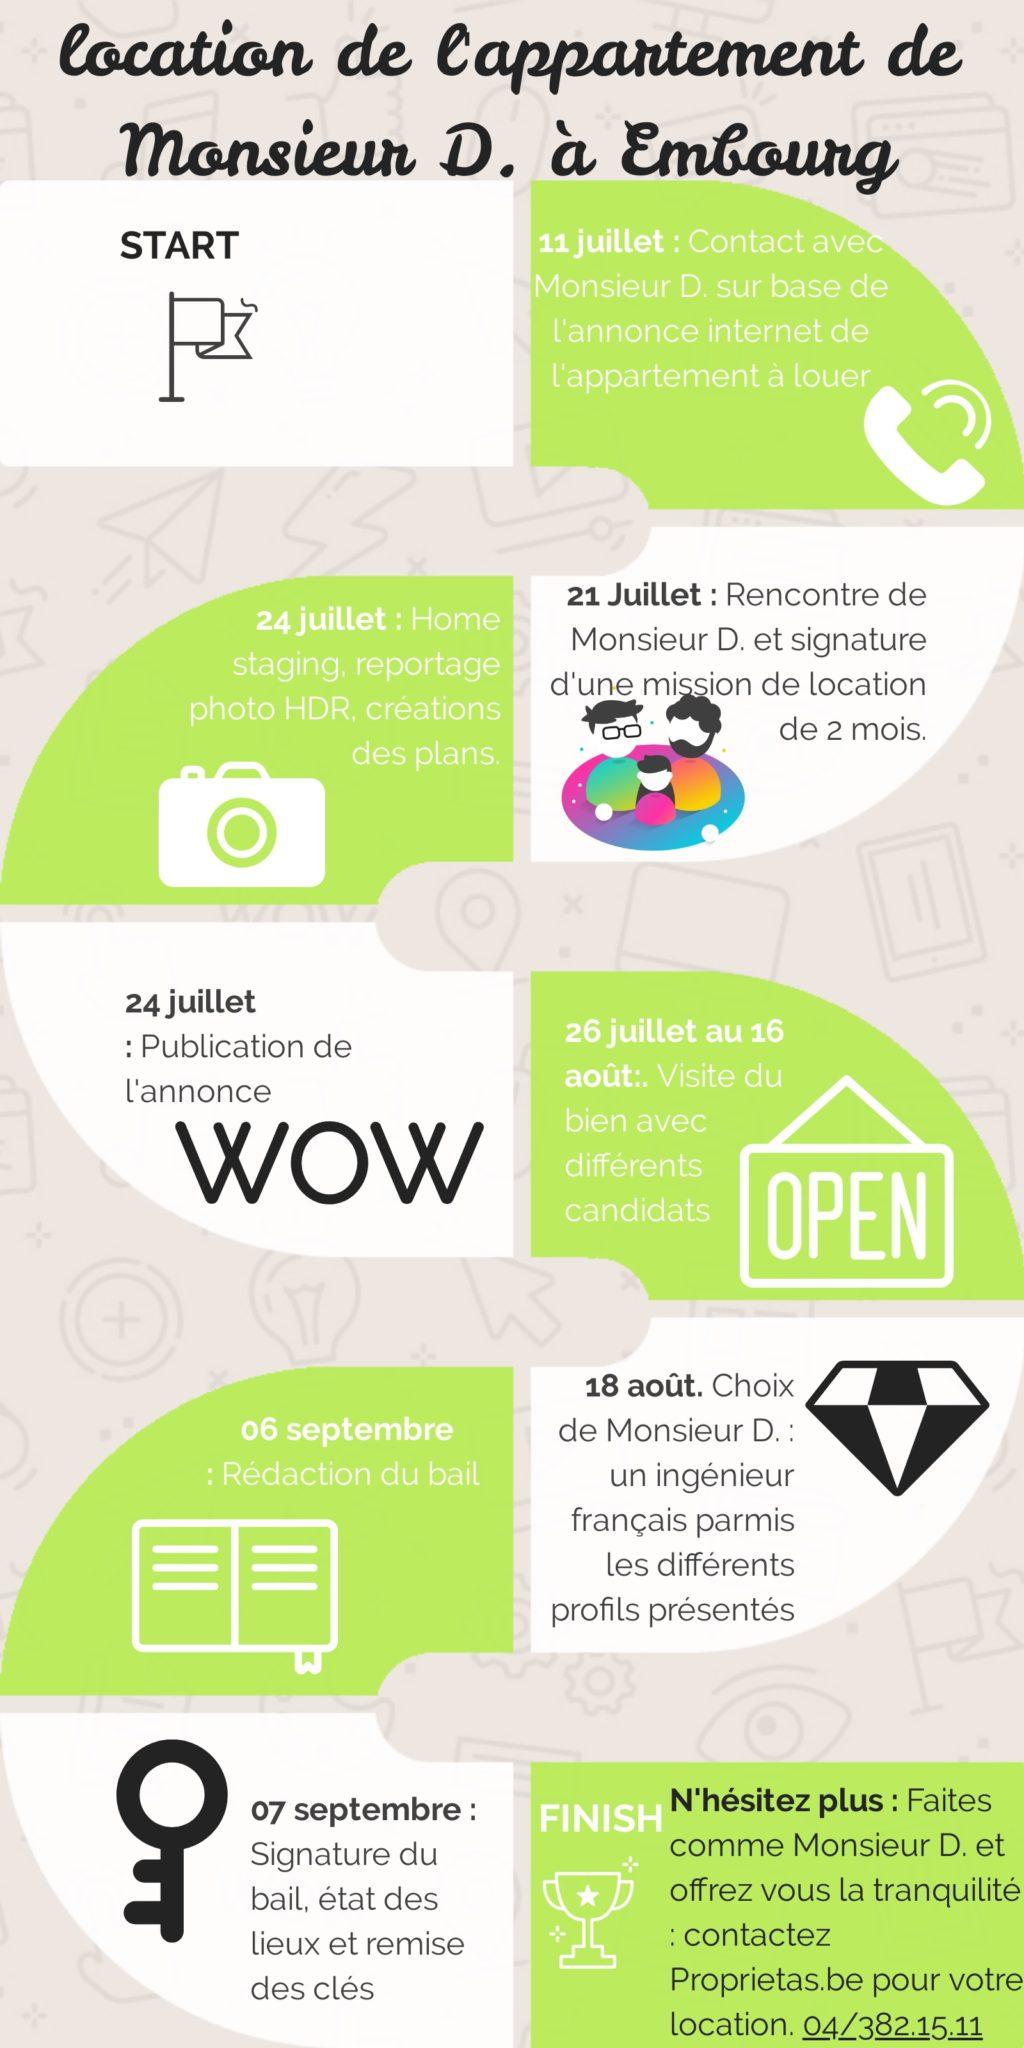 Processus de location avec Proprietas.be